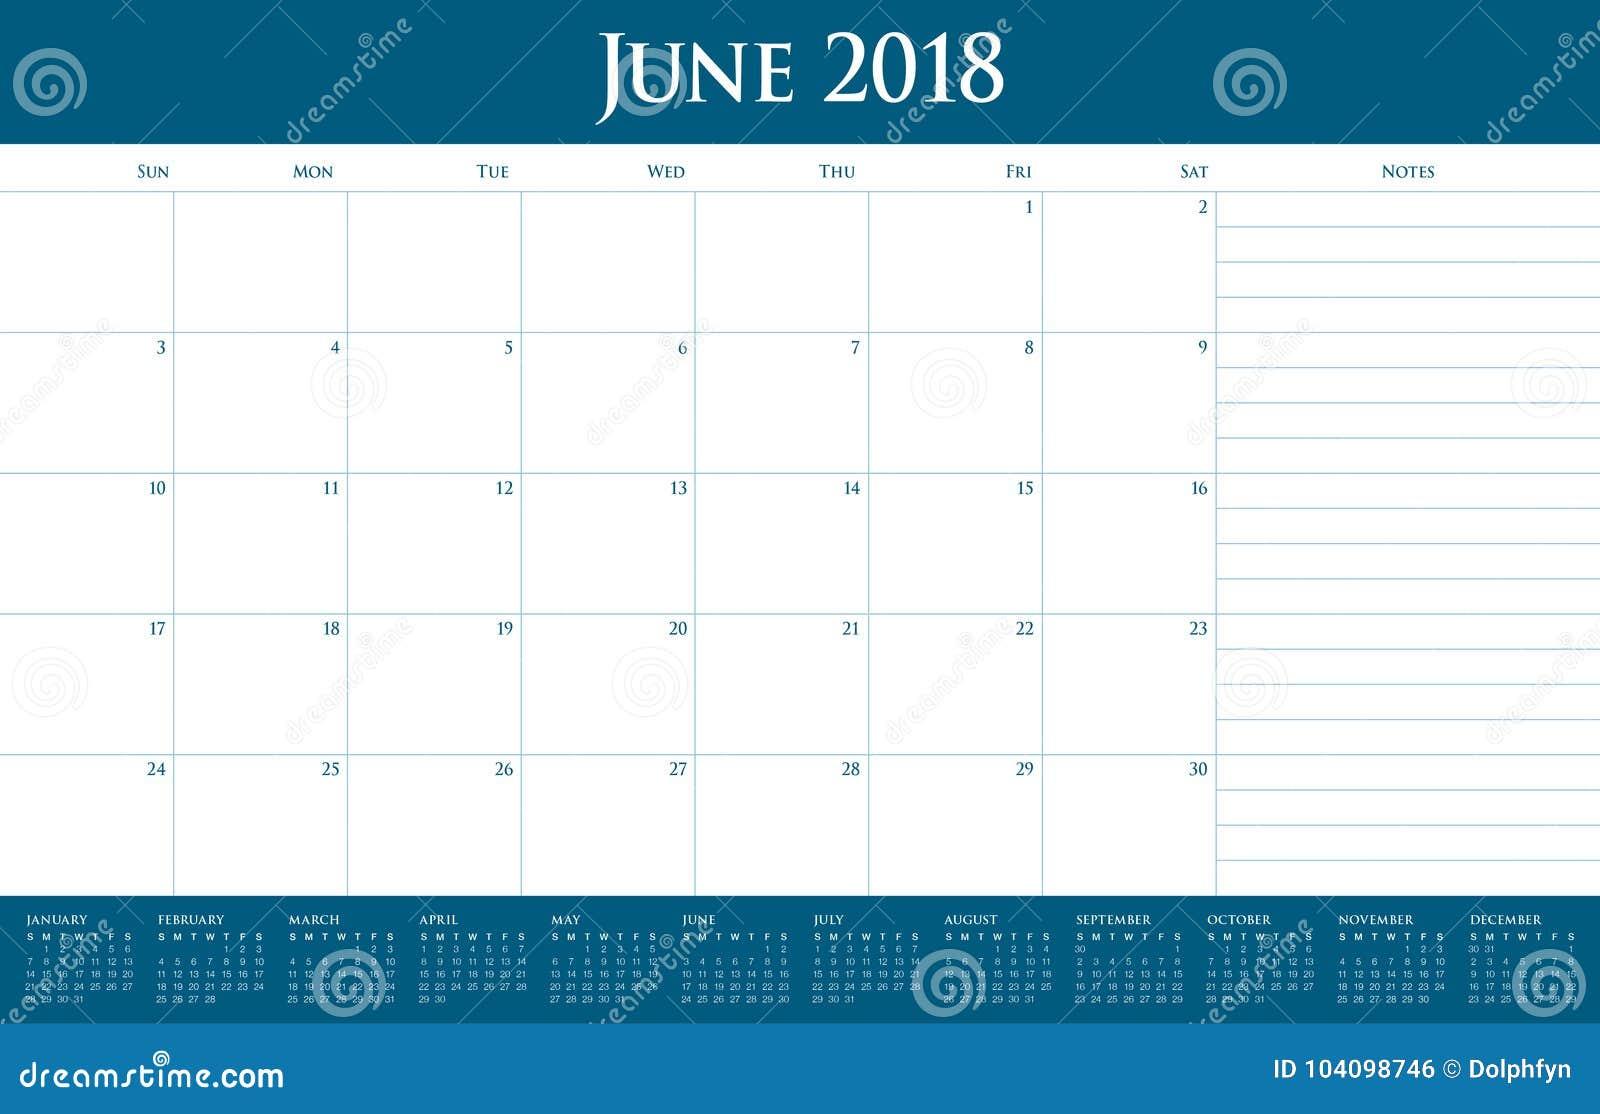 June Calendar Vector : June calendar planner vector illustration stock